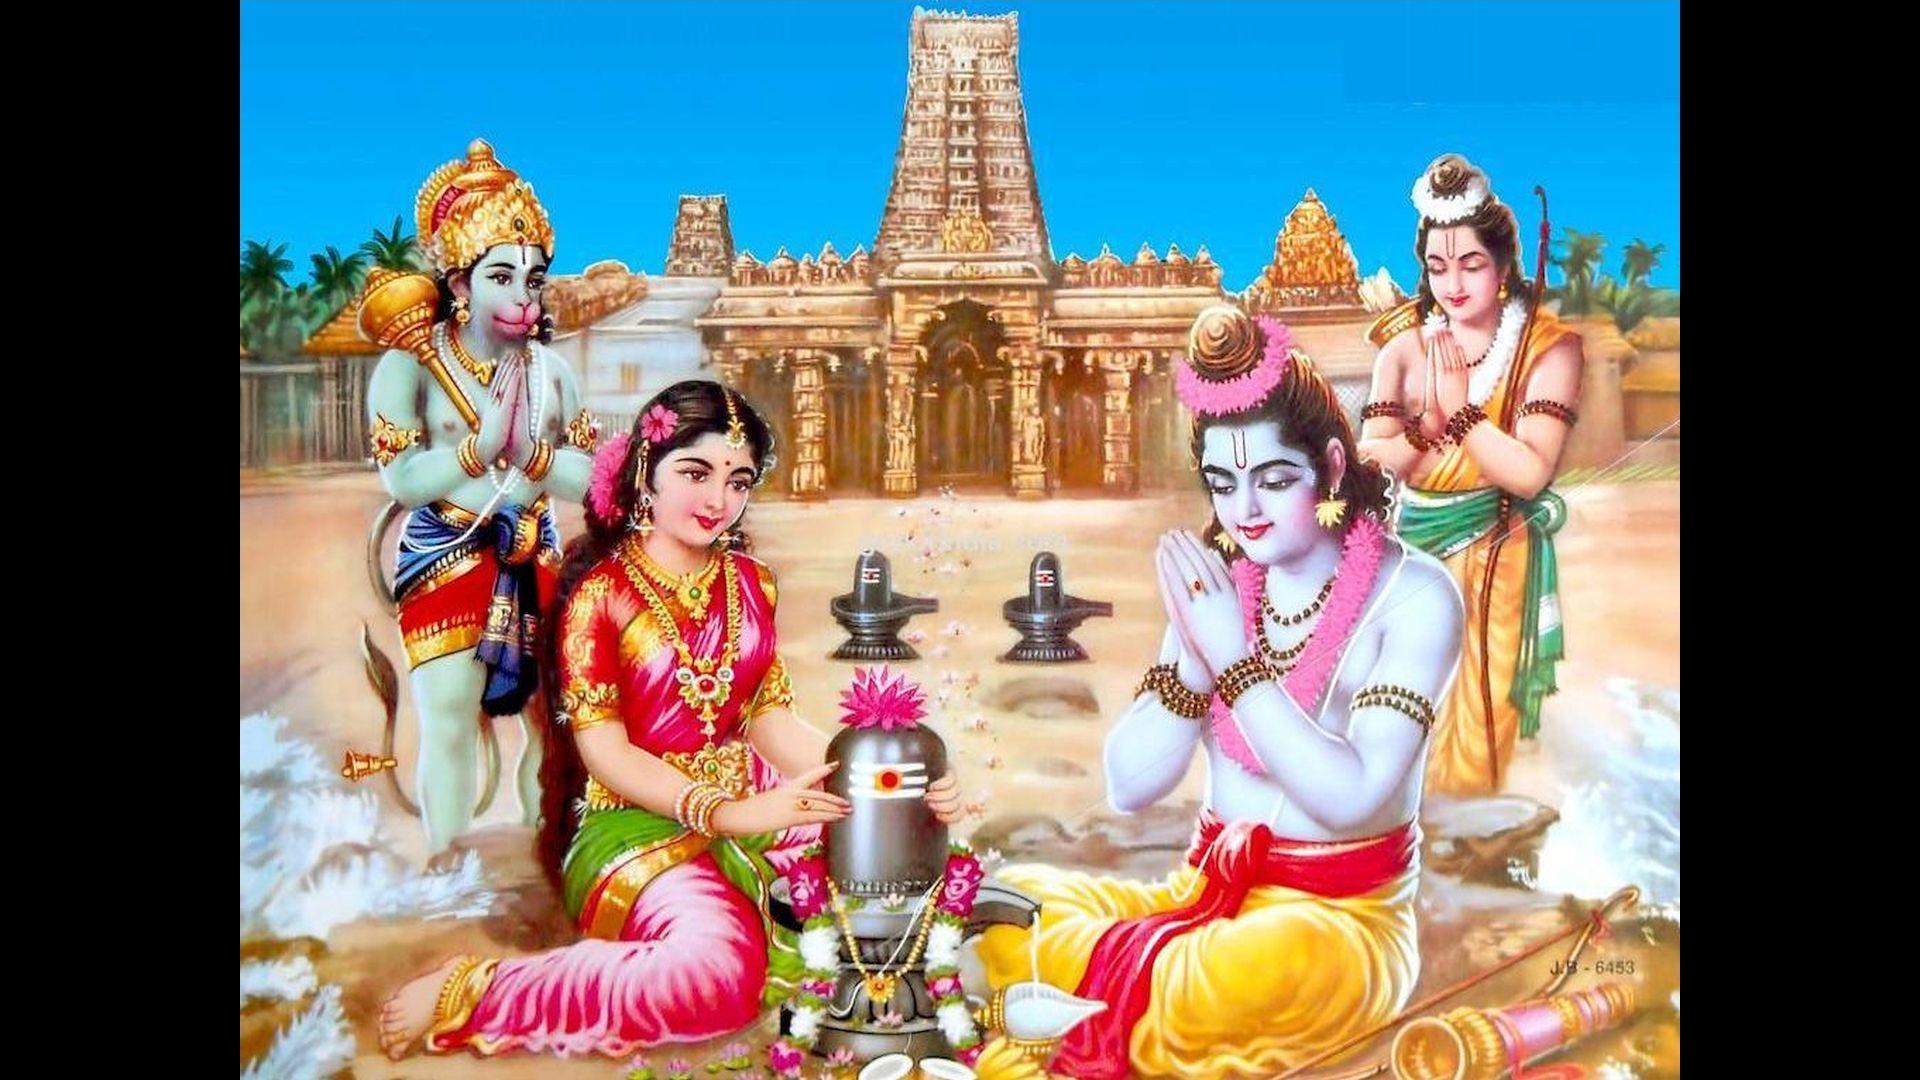 Panchmukhi Ganesh Wallpaper Hd Lord Hanuman Free Download God Hd Wallpapers